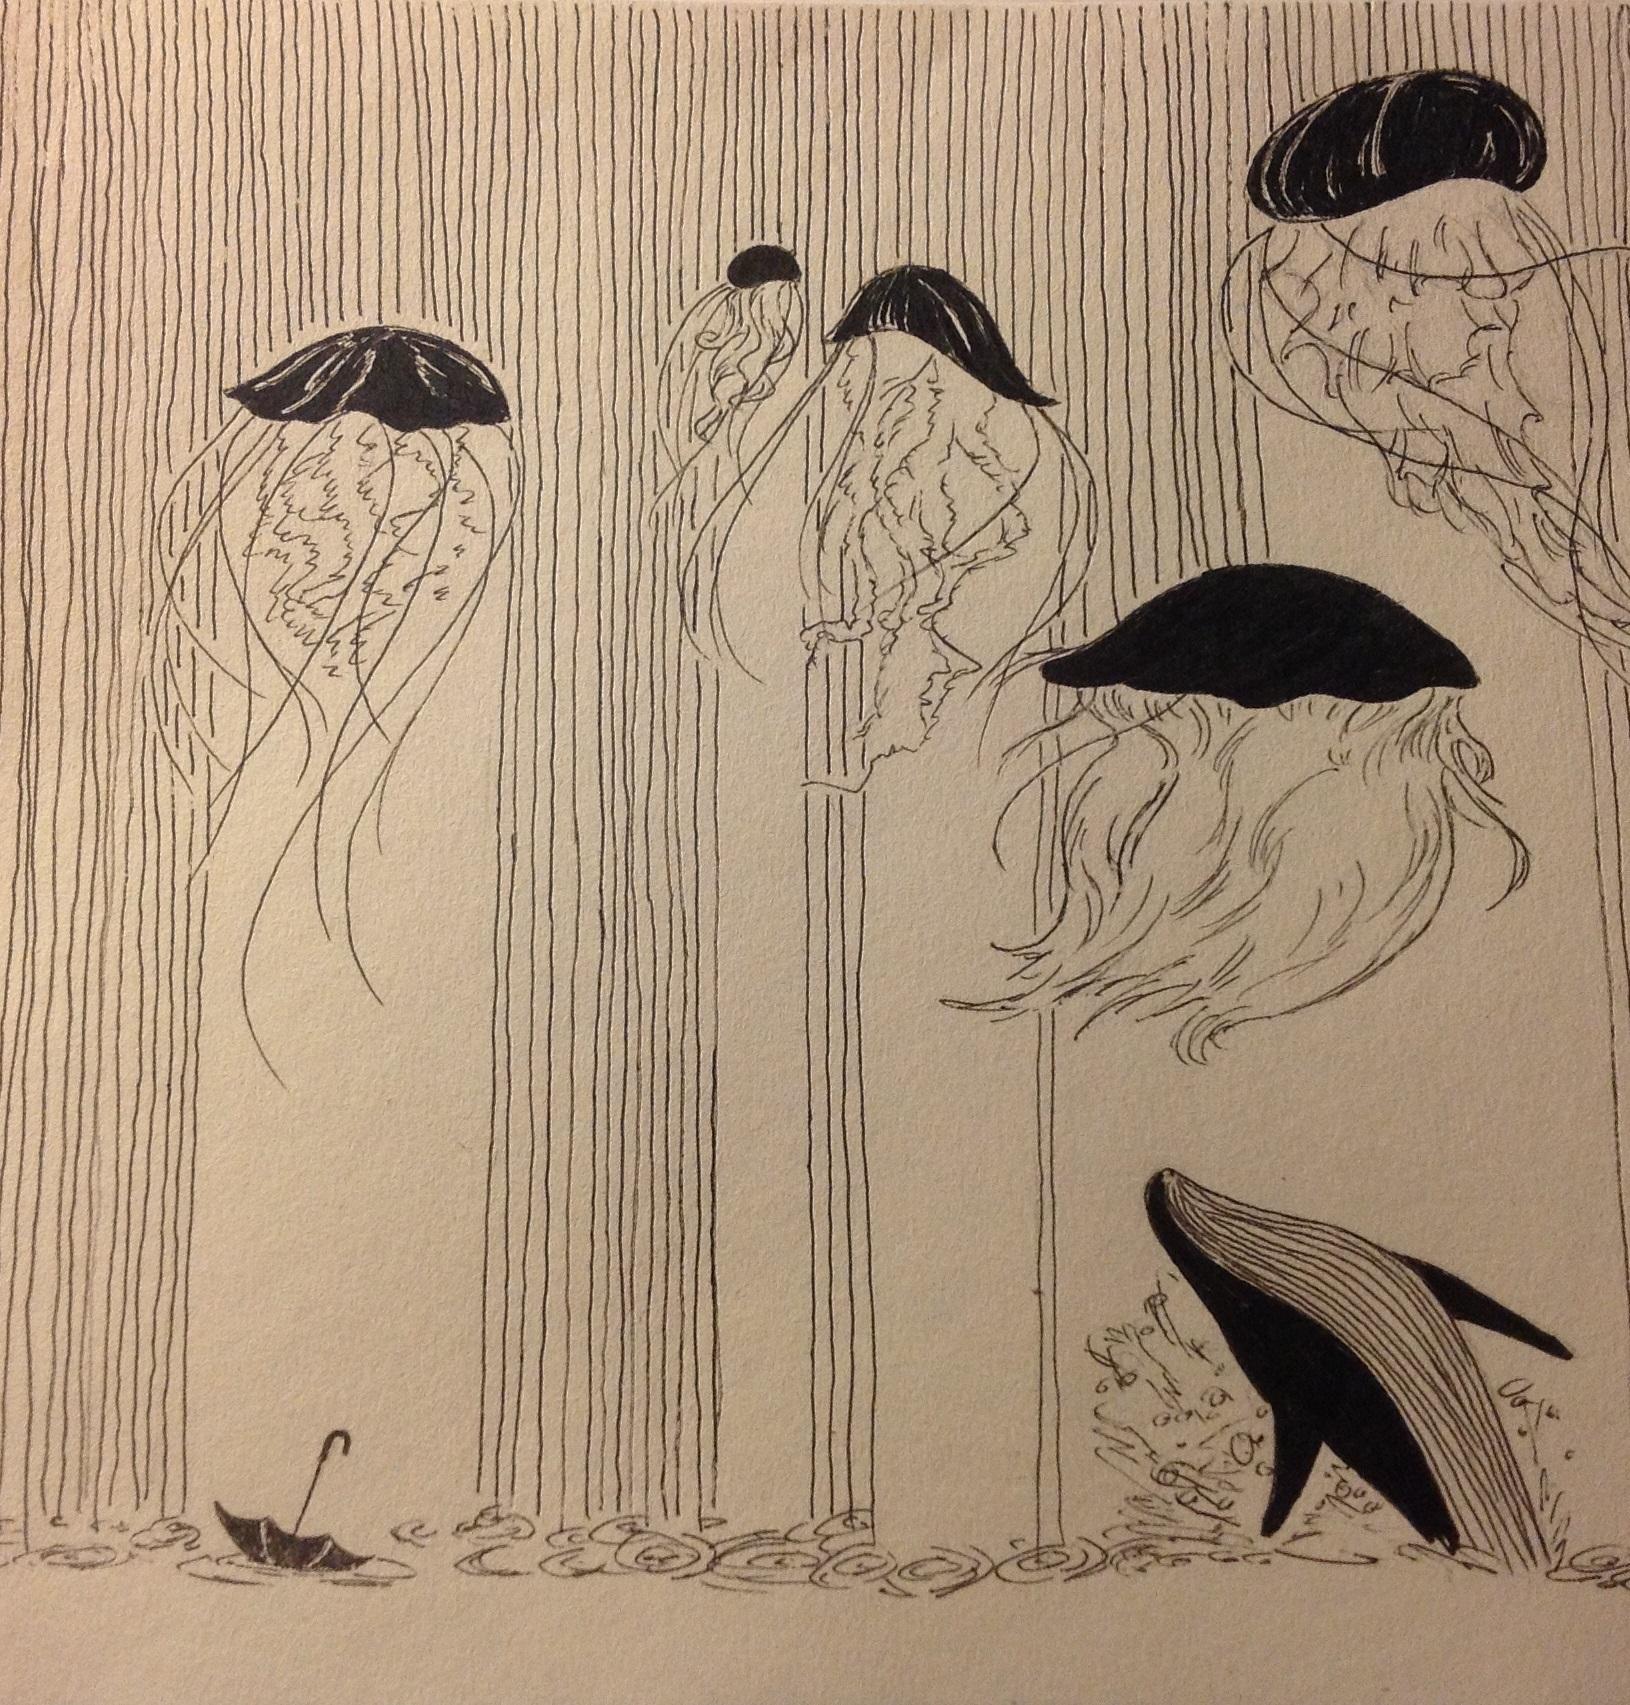 Aquatic Fantasies